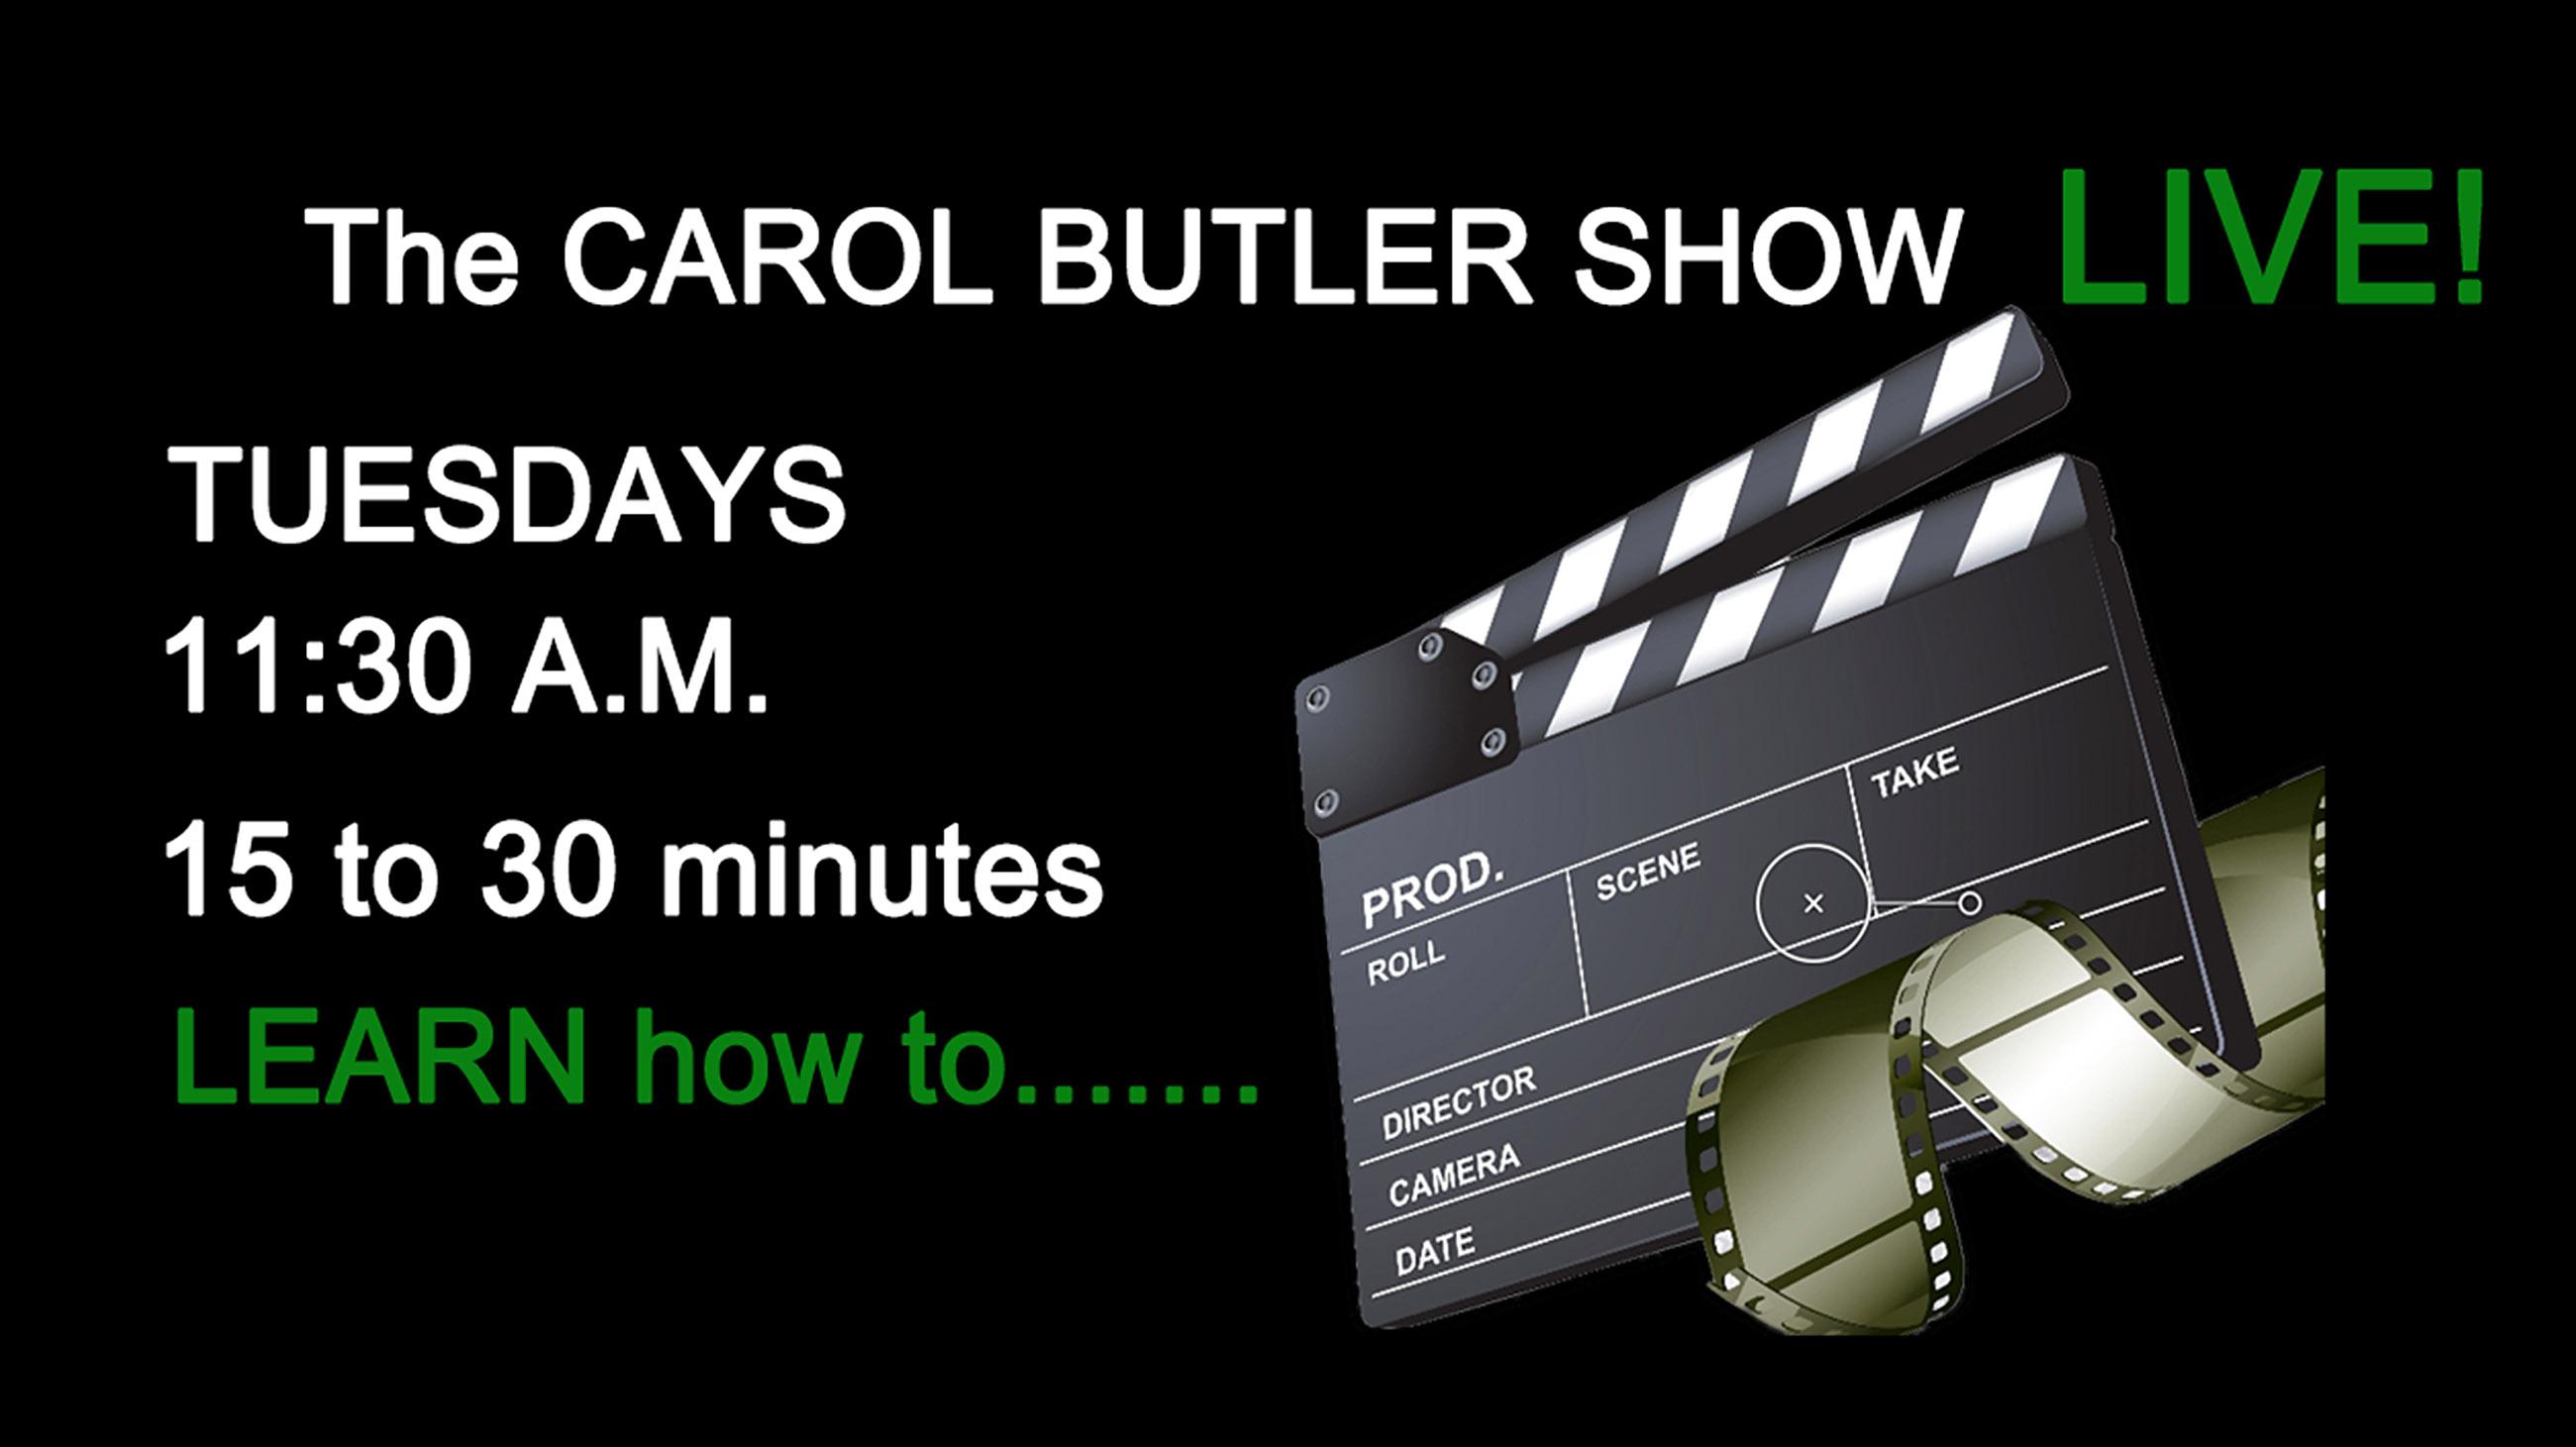 The Carol Butler Show LIVE